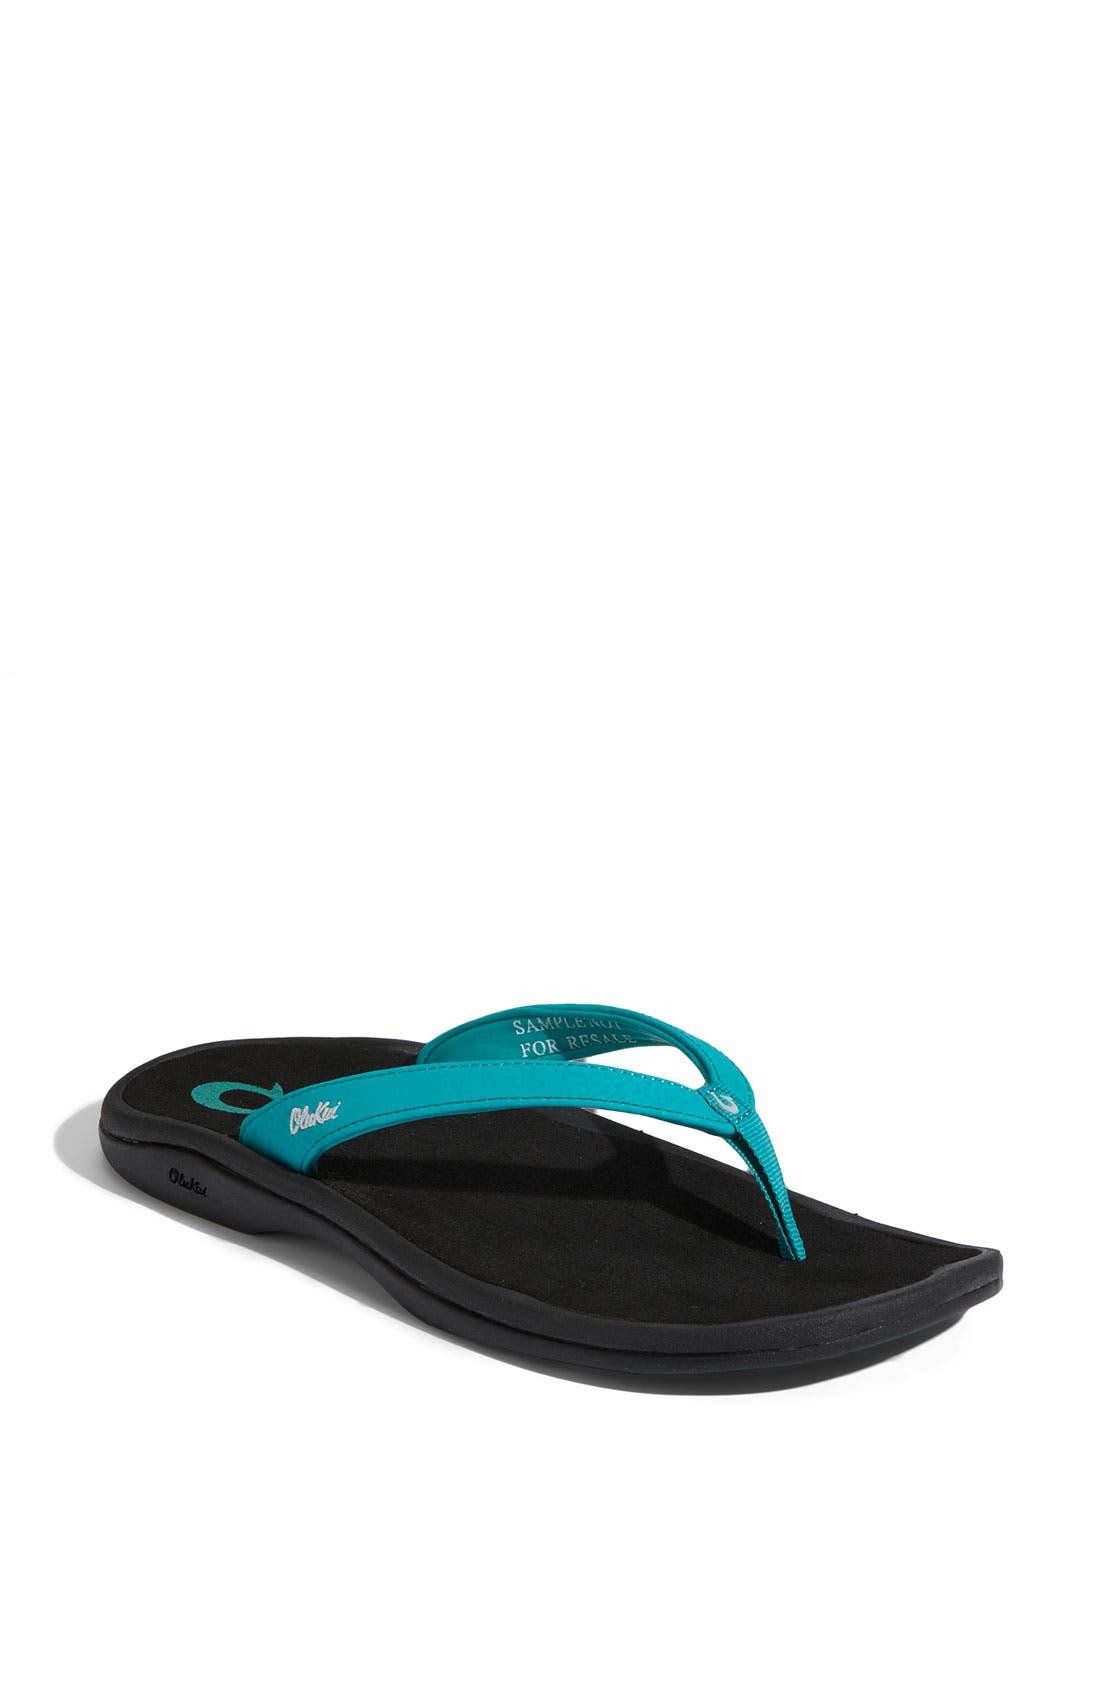 Main Image - OluKai 'Amo-W' Flip Flop